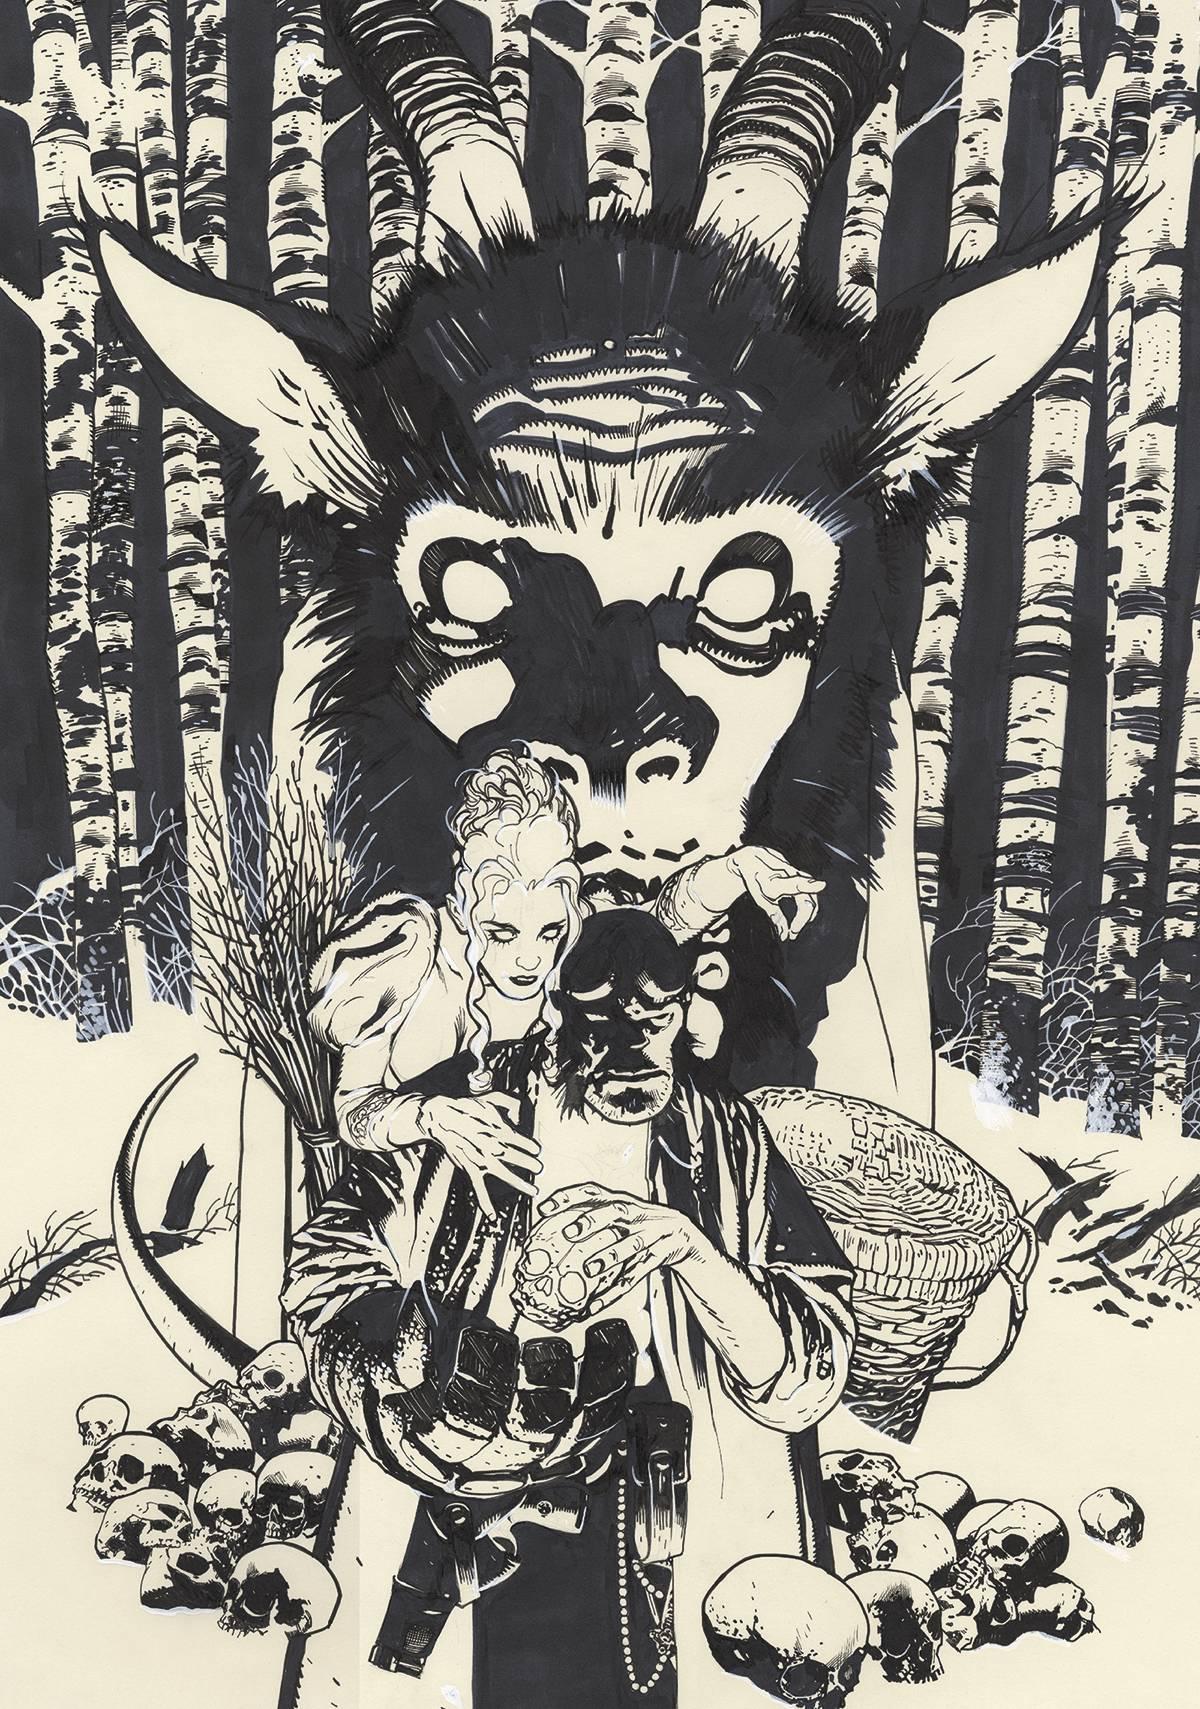 HELLBOY KRAMPUSNACHT #1 ADAM HUGHES SKETCH COVER